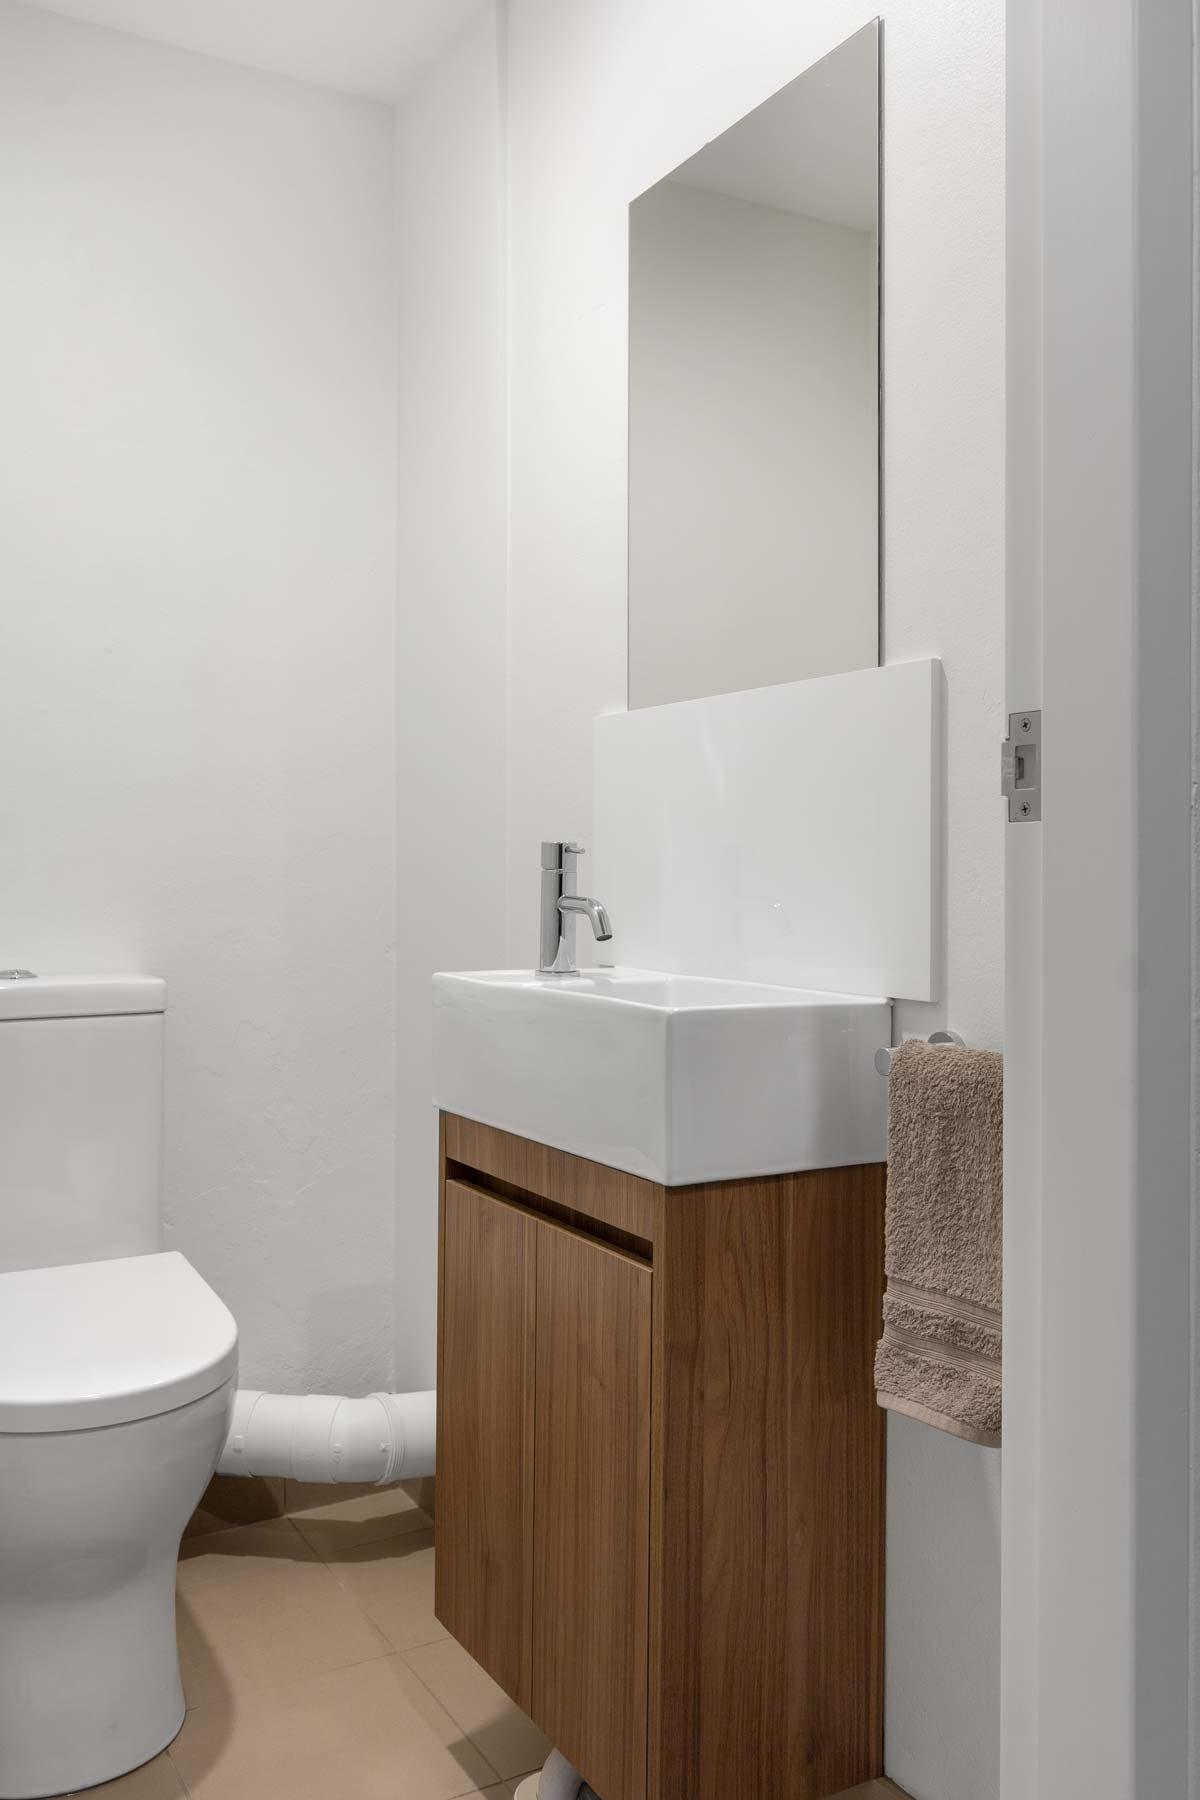 Bathroom renovation Sydney featuring custom made timber look vanity in Walnut.